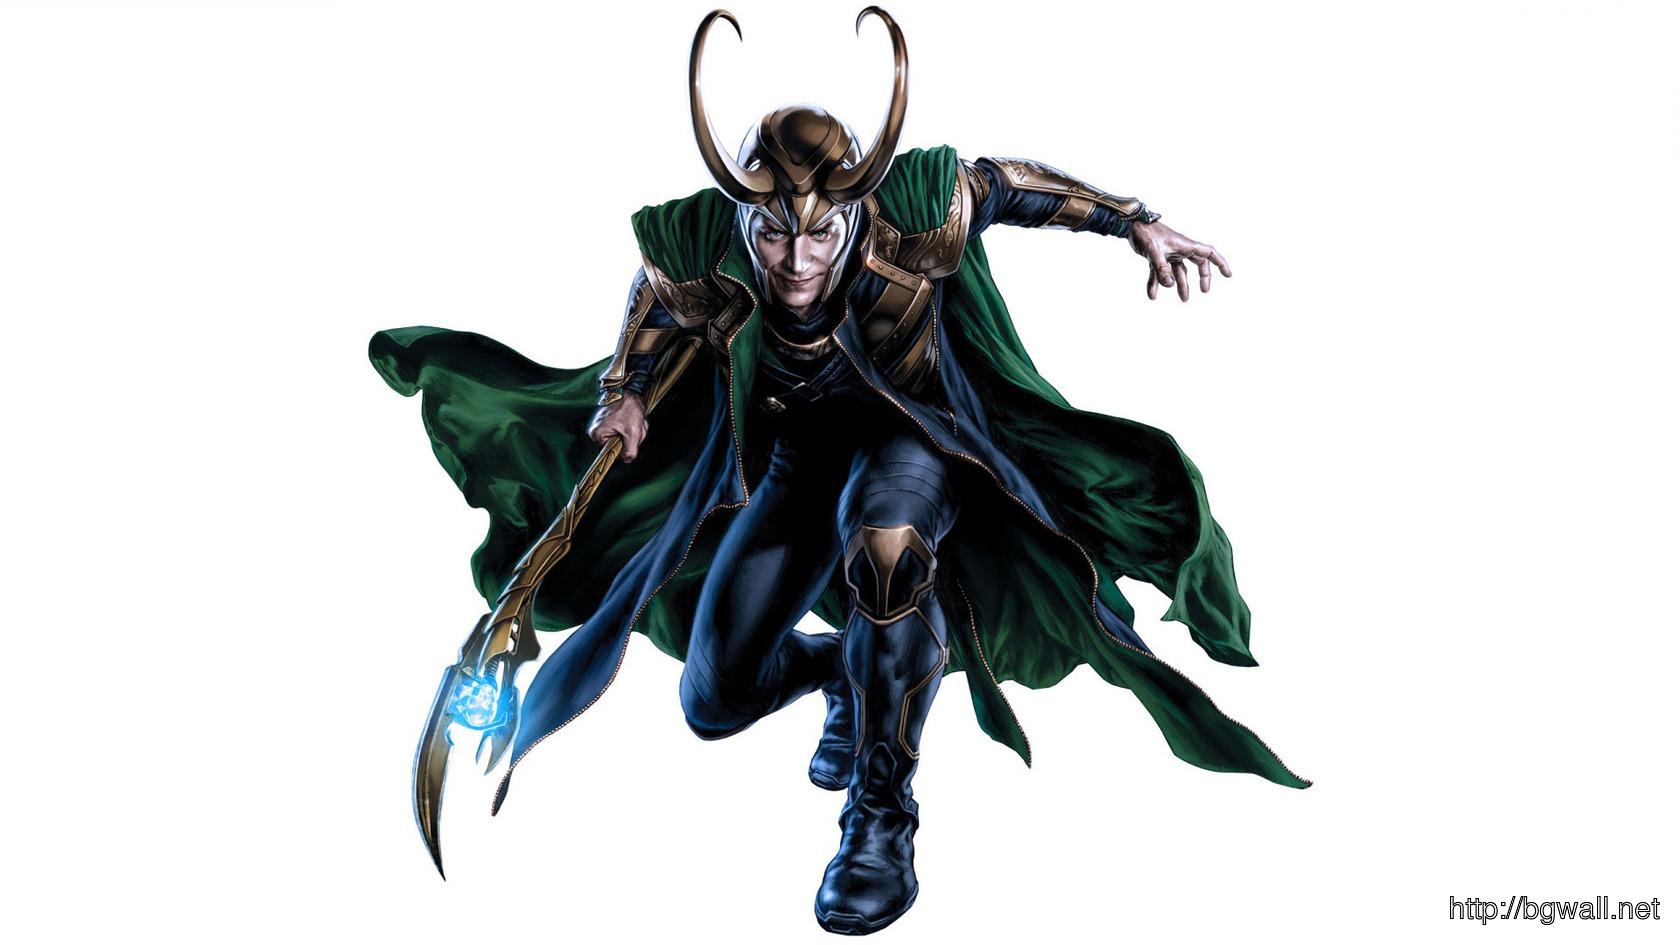 Loki Laufeyson Wallpaper 11366 Full Size